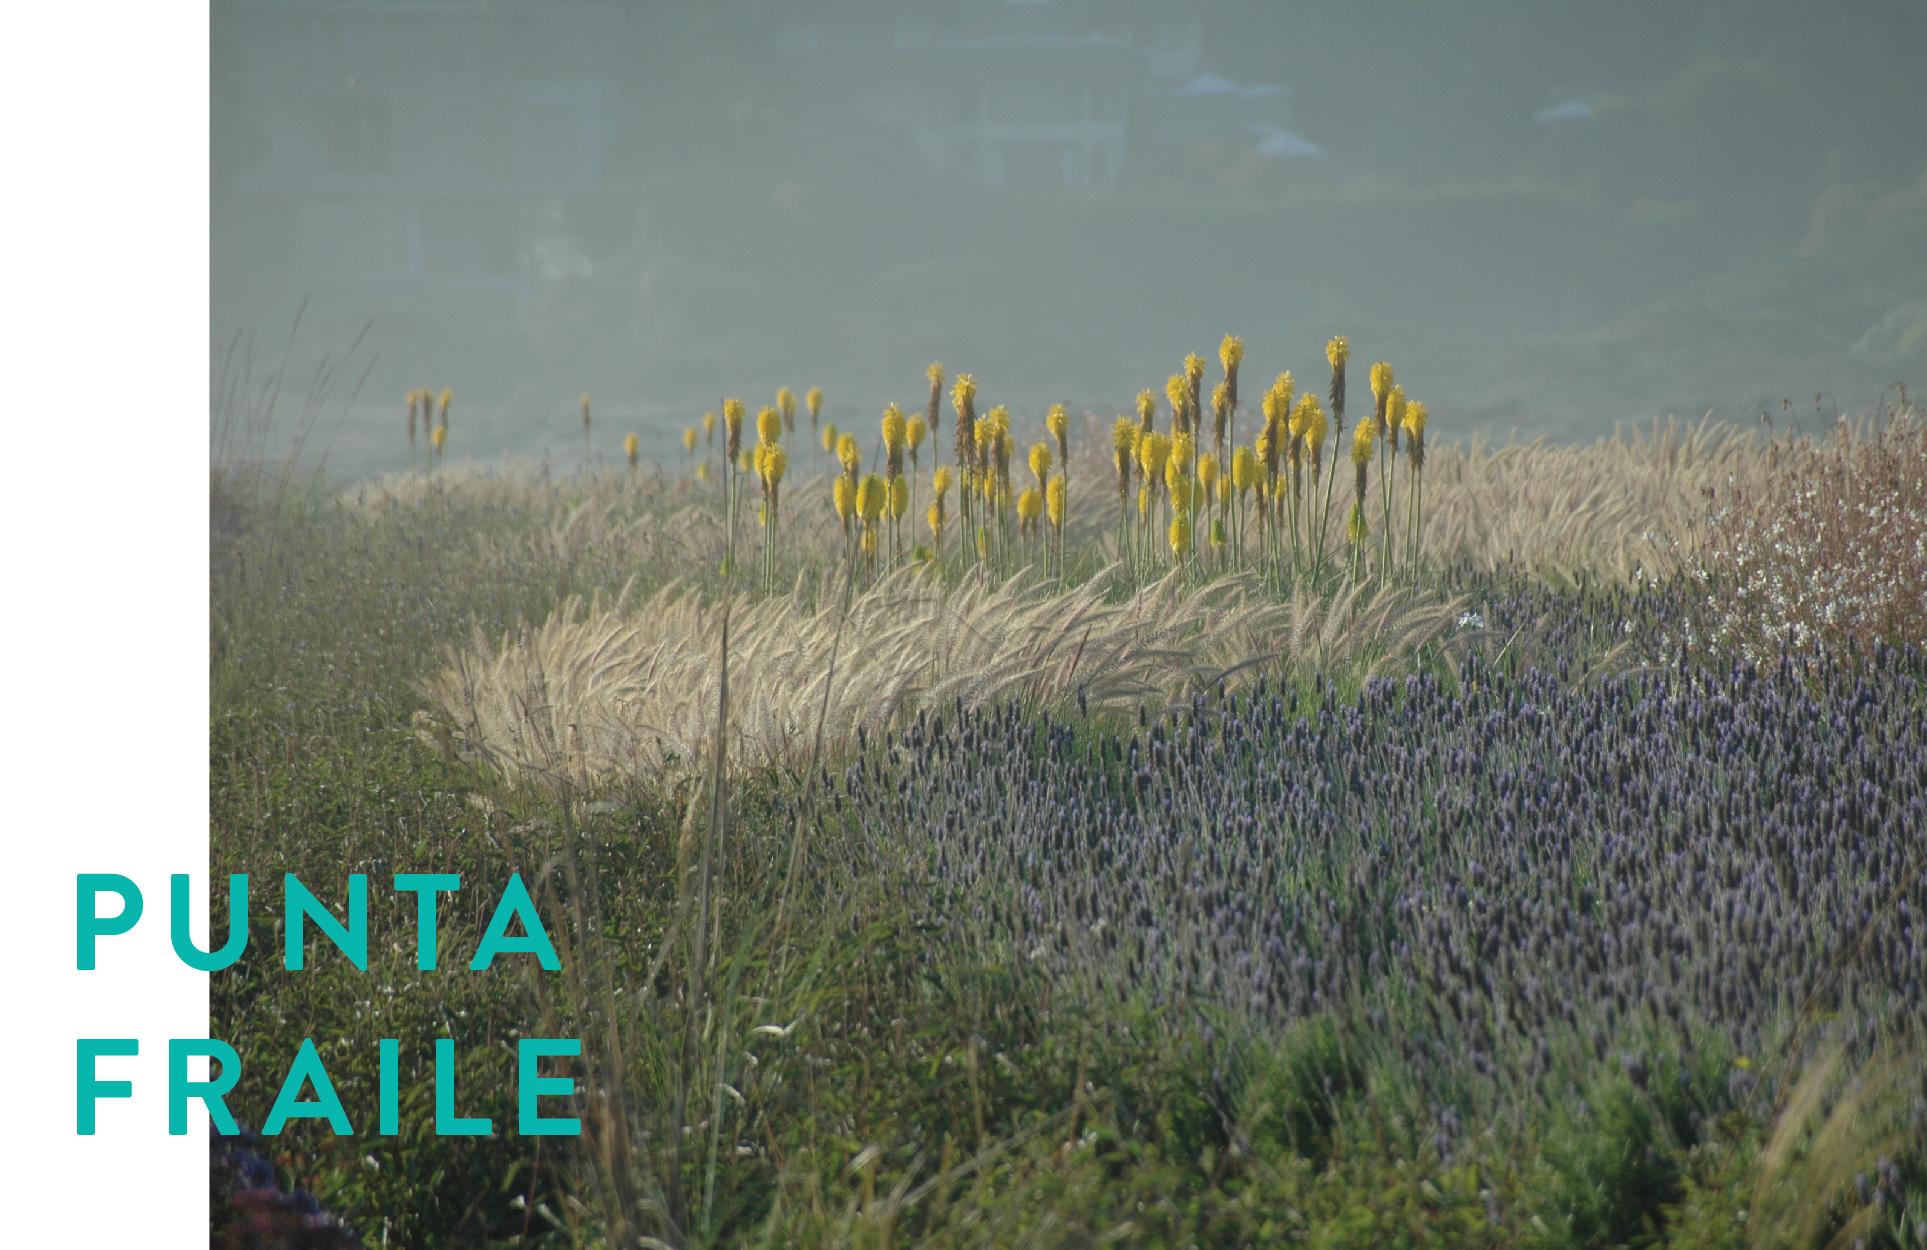 Formato Panoramico PUNTA FRAILE-01.jpg